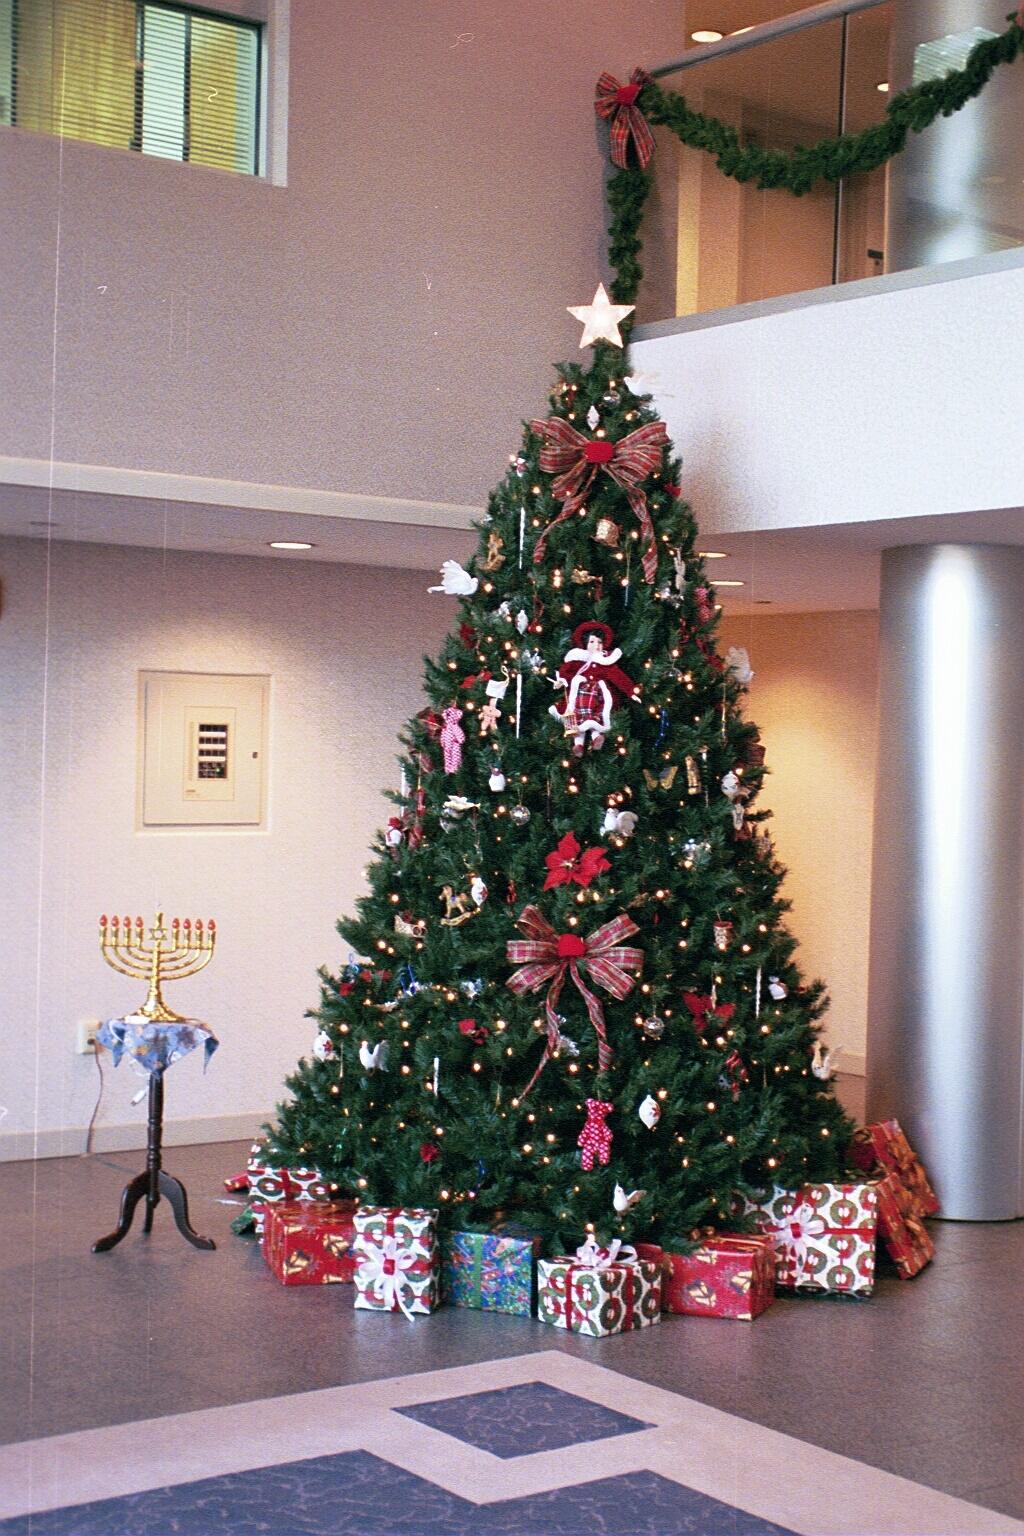 10ft Christmas Trees